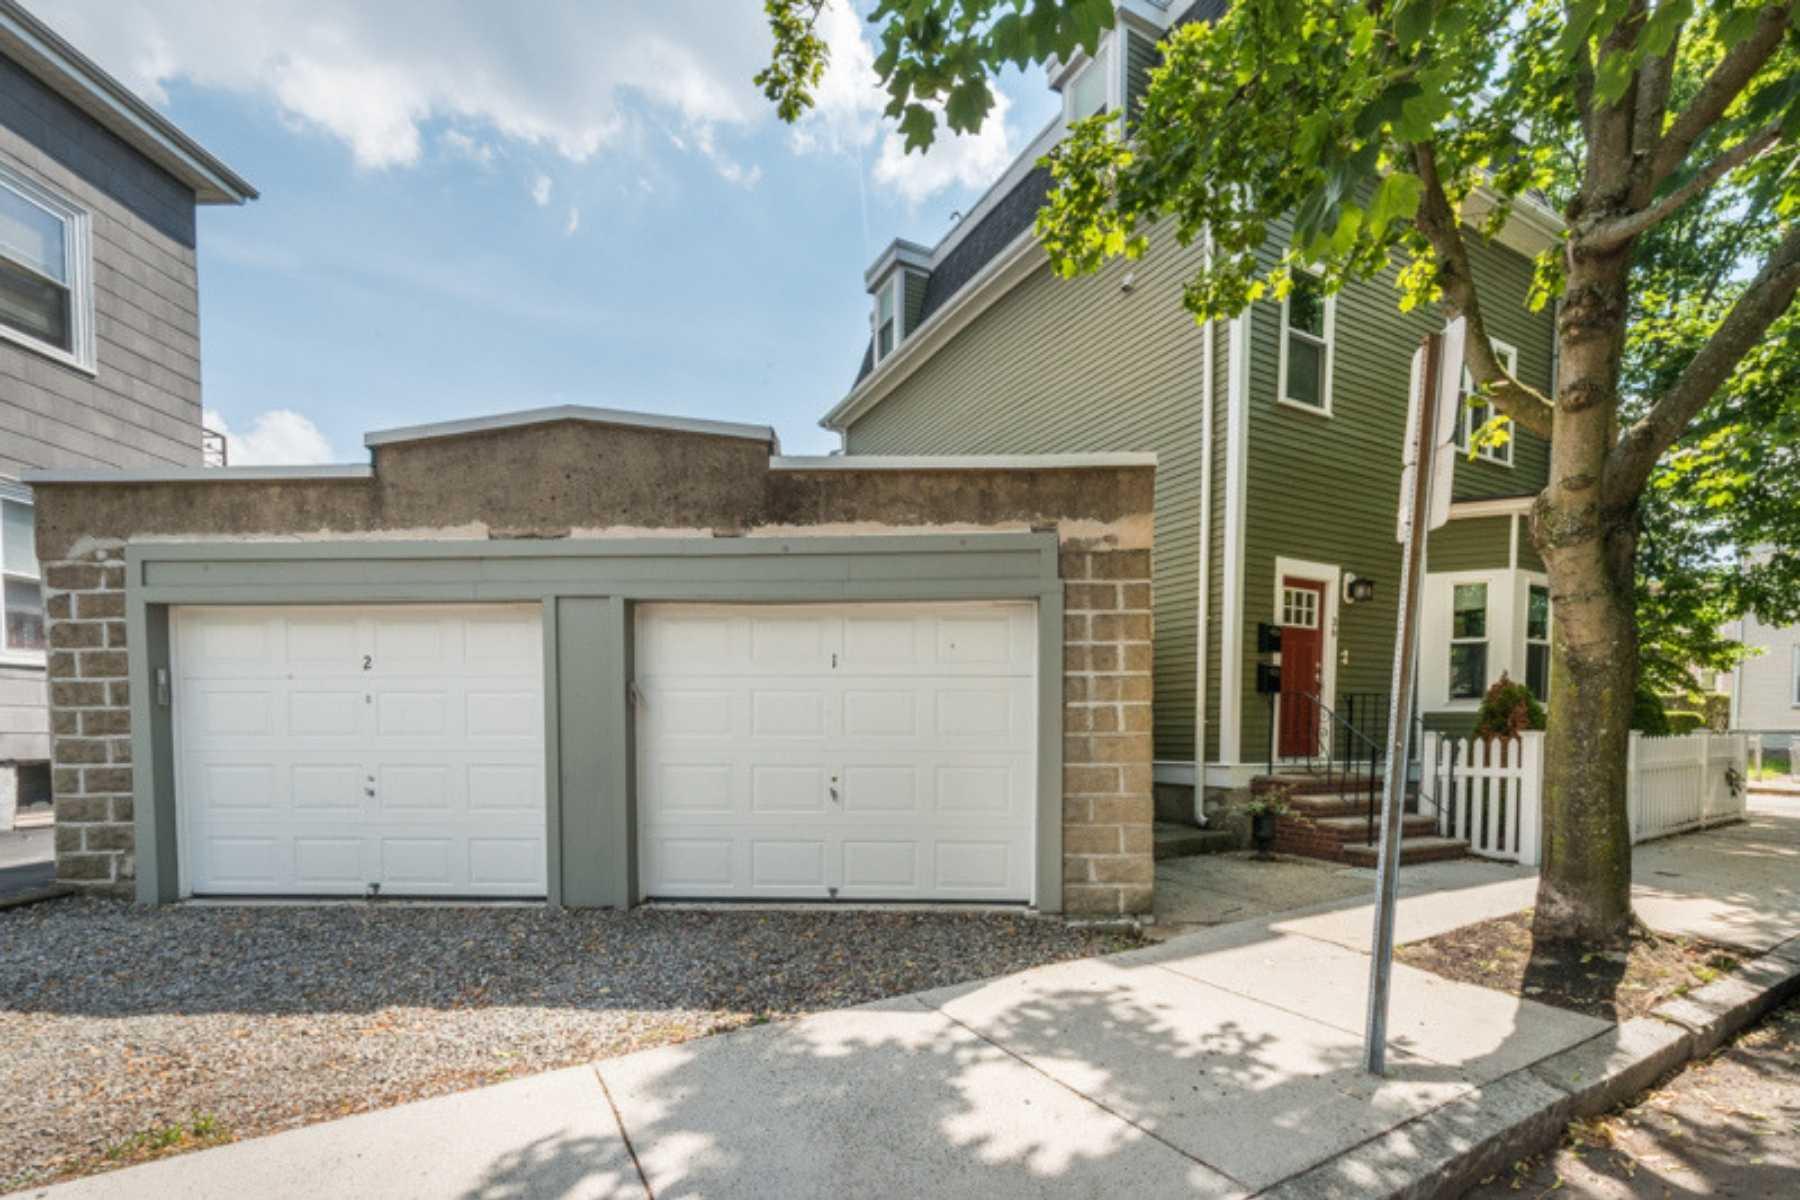 3-CapstoneCommunities-property-OakStreetCondominiums-Somerville.jpg